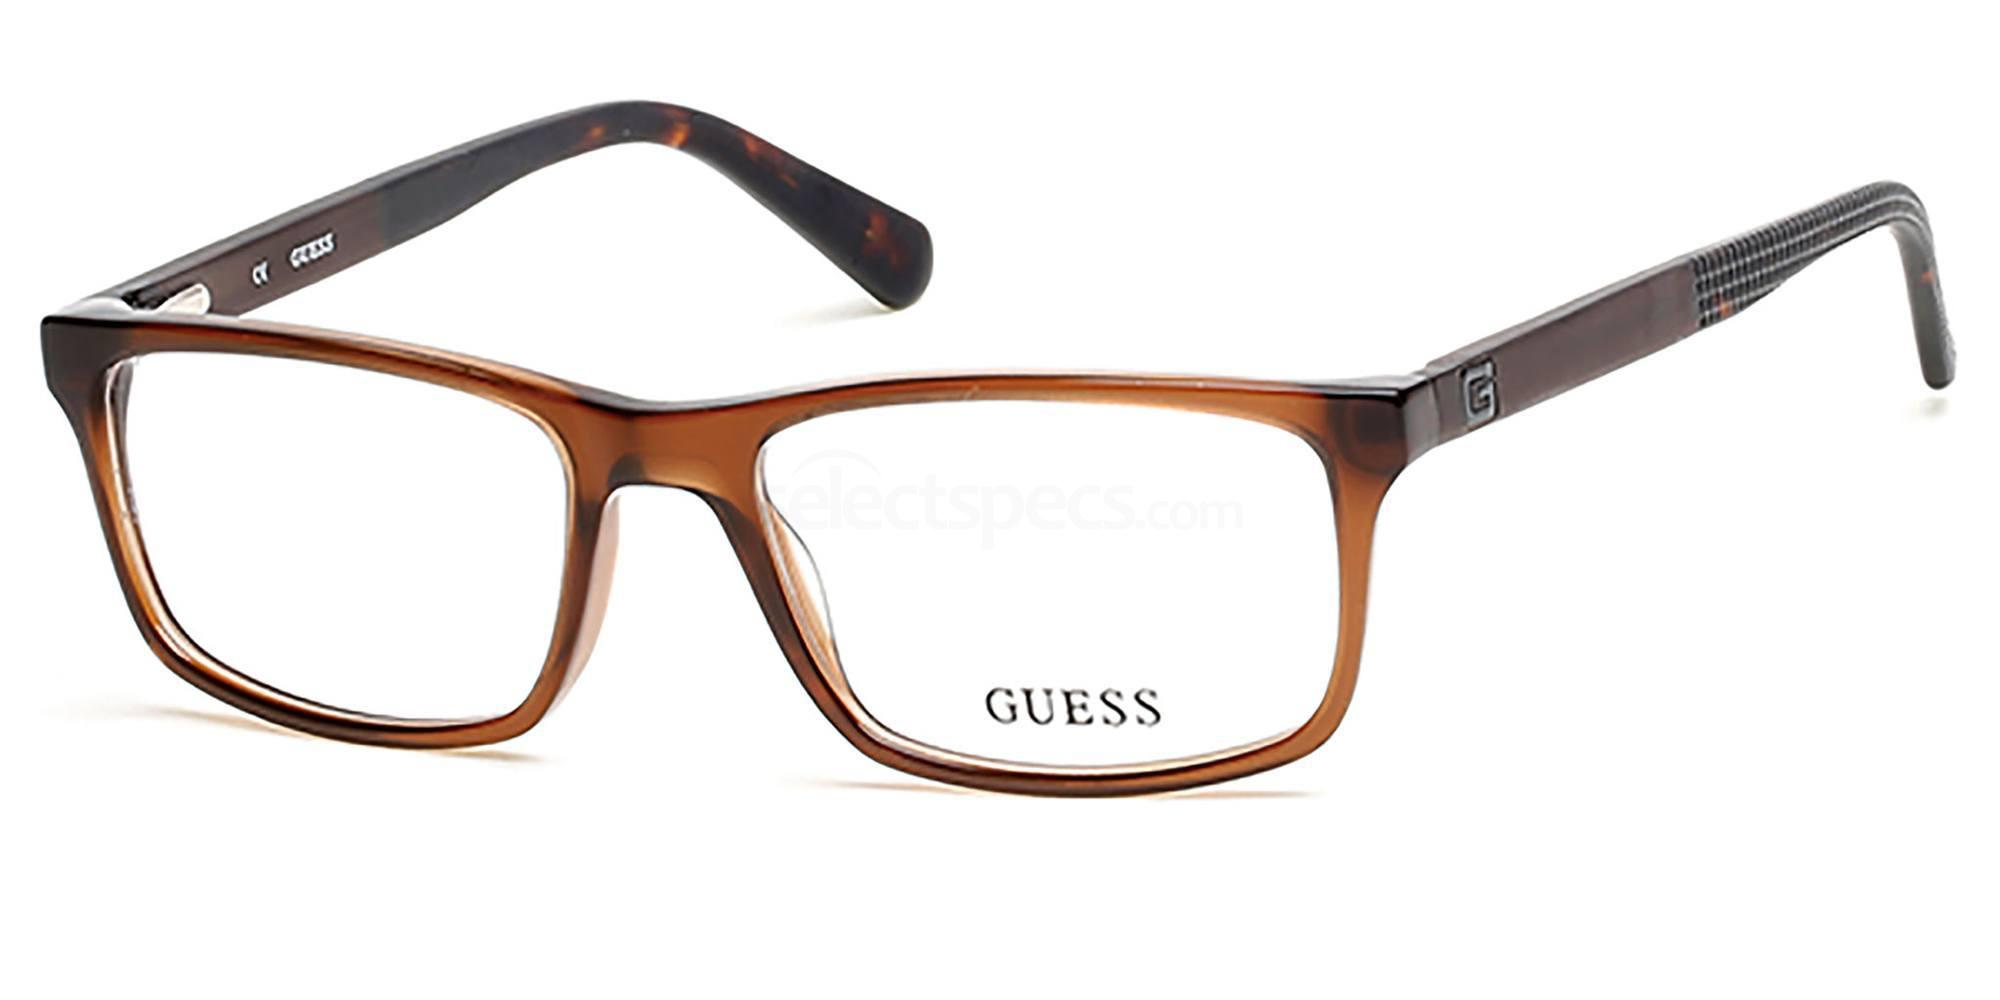 048 GU1878 Glasses, Guess